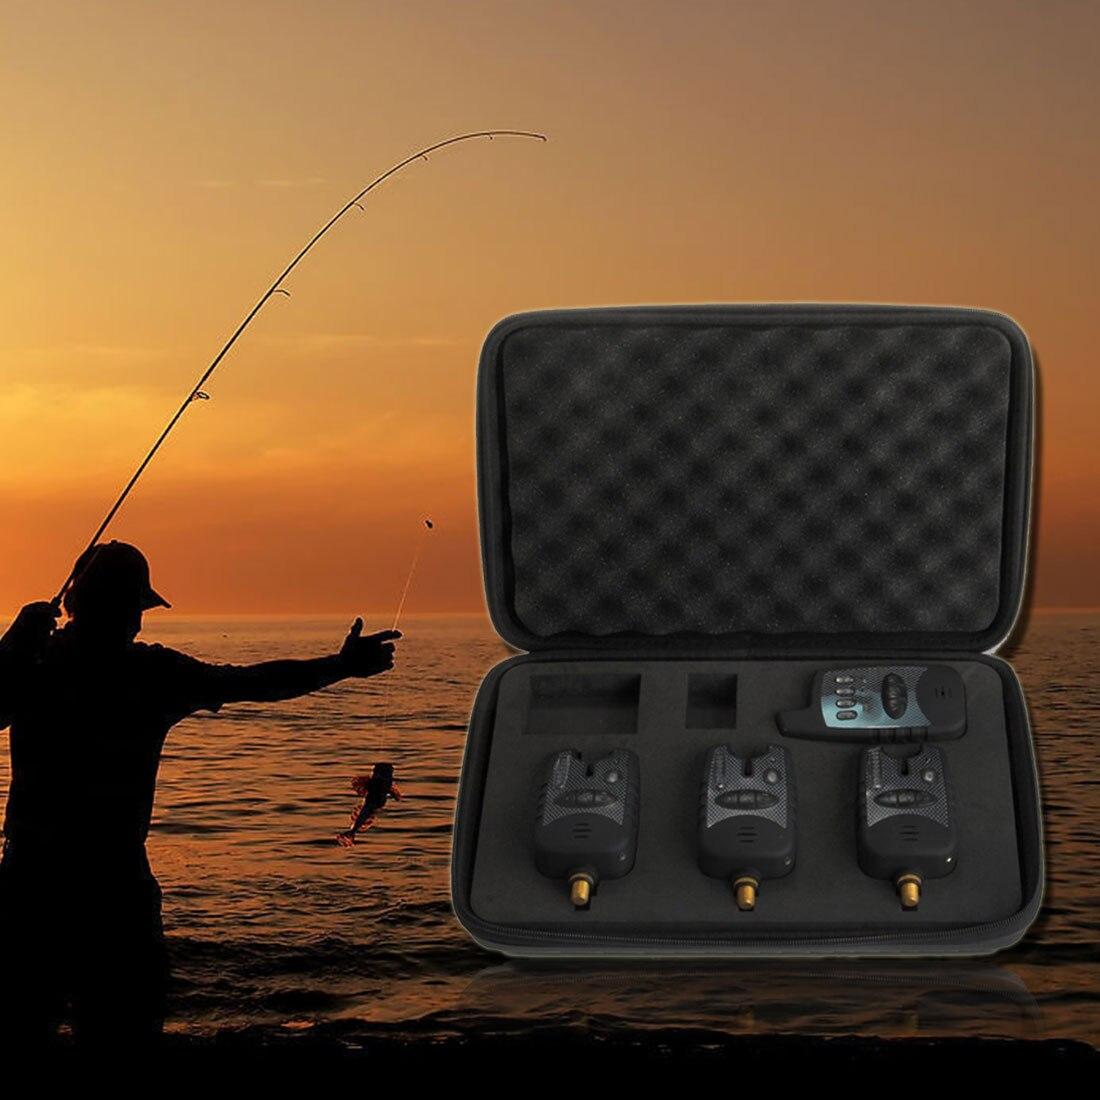 2018 Brand New Hot Sale New Set 3 PCS Wireless Running Fishing Bite Alarm Alert + Receiver pesca Tackle2018 Brand New Hot Sale New Set 3 PCS Wireless Running Fishing Bite Alarm Alert + Receiver pesca Tackle